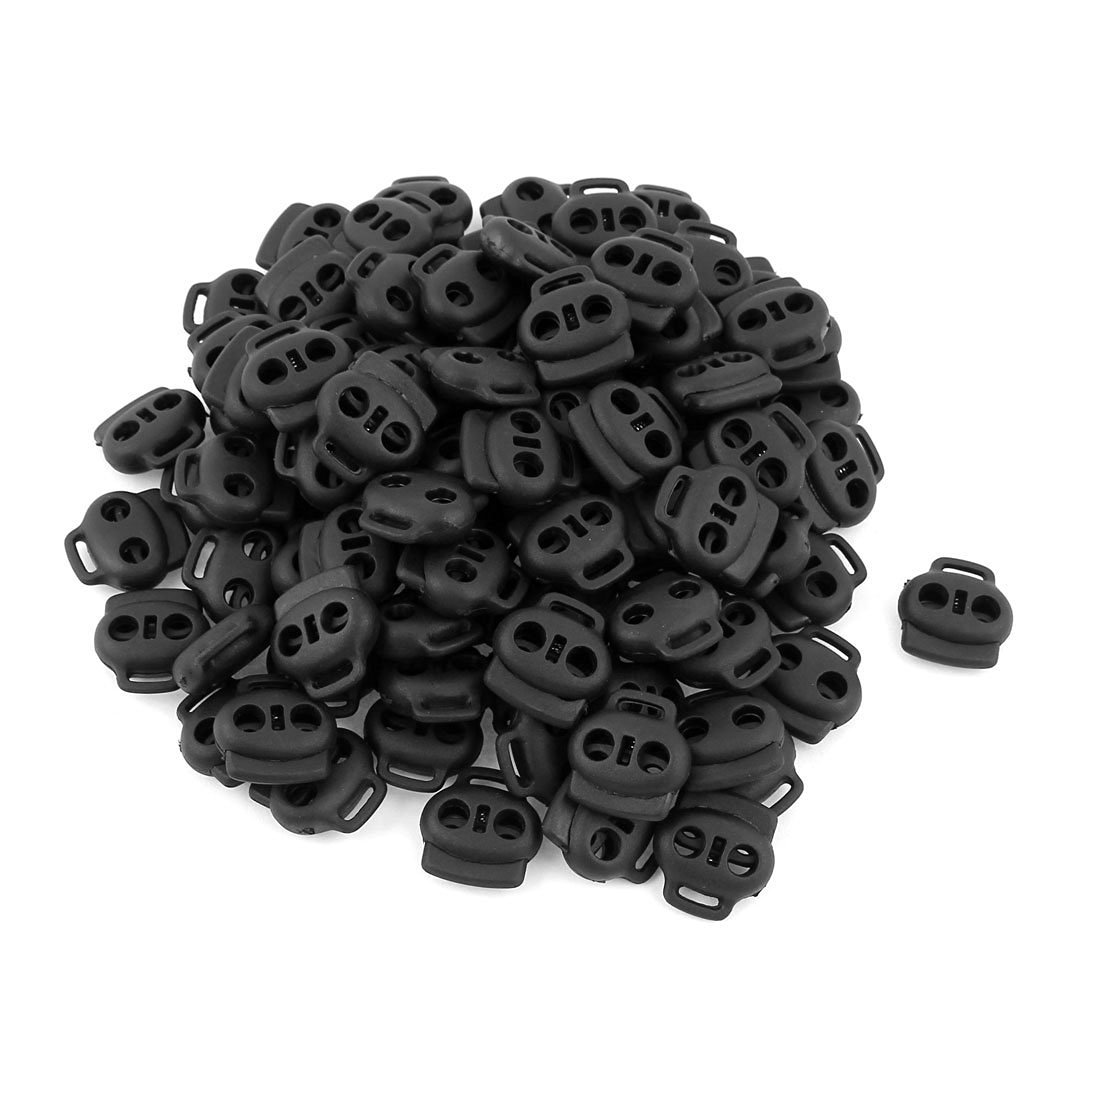 YOYOSTORE 20 Pcs Black Double Holes Black Oval Bean Lanyard Cord Lock Stopper Fastener Slider Diy